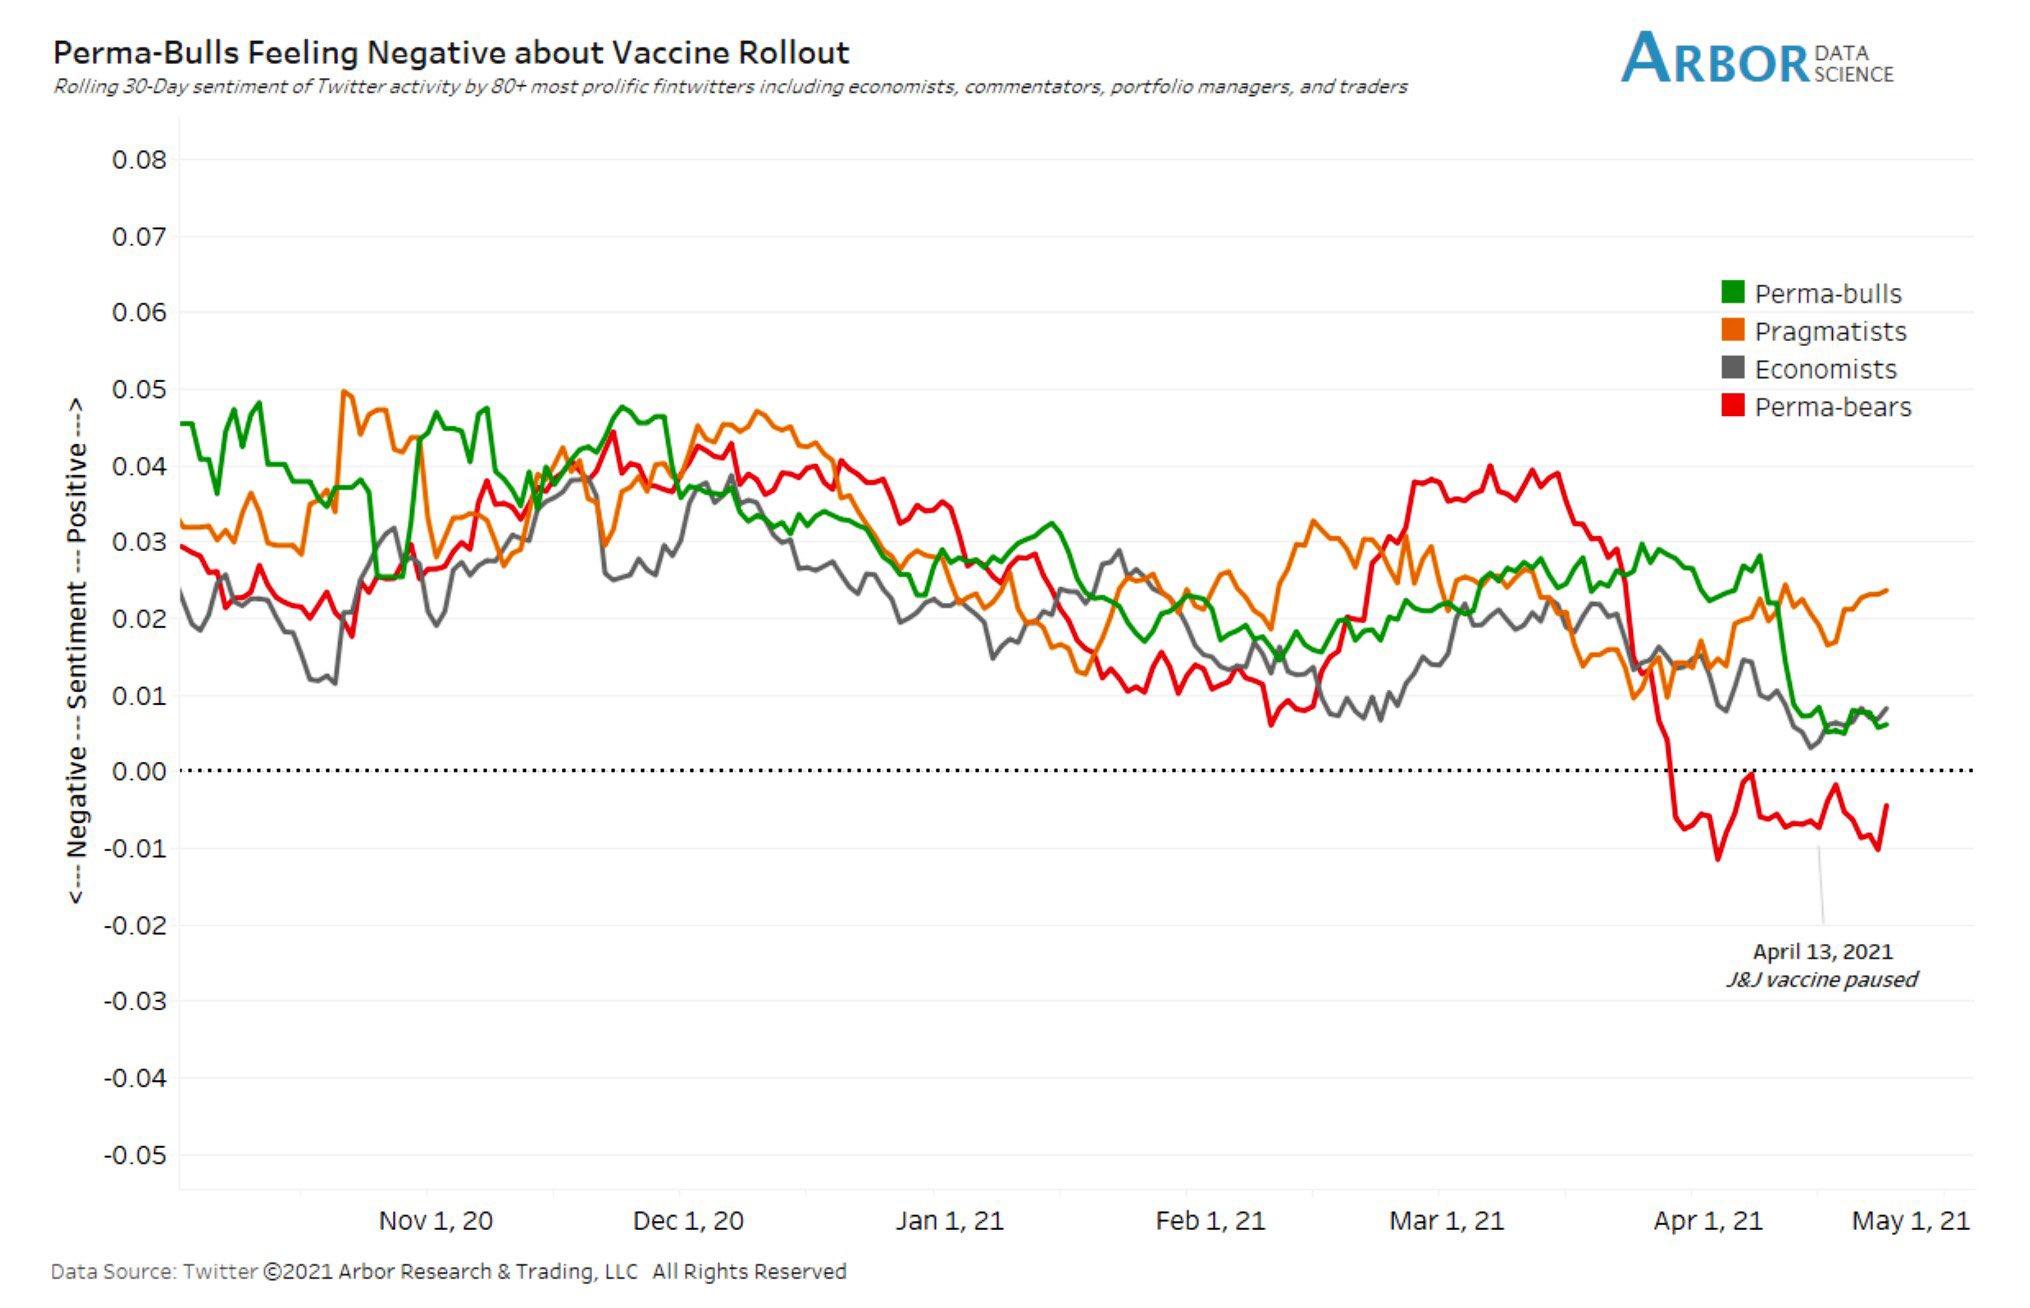 Vaccine sentiments: perma-bulls feeling less bullish